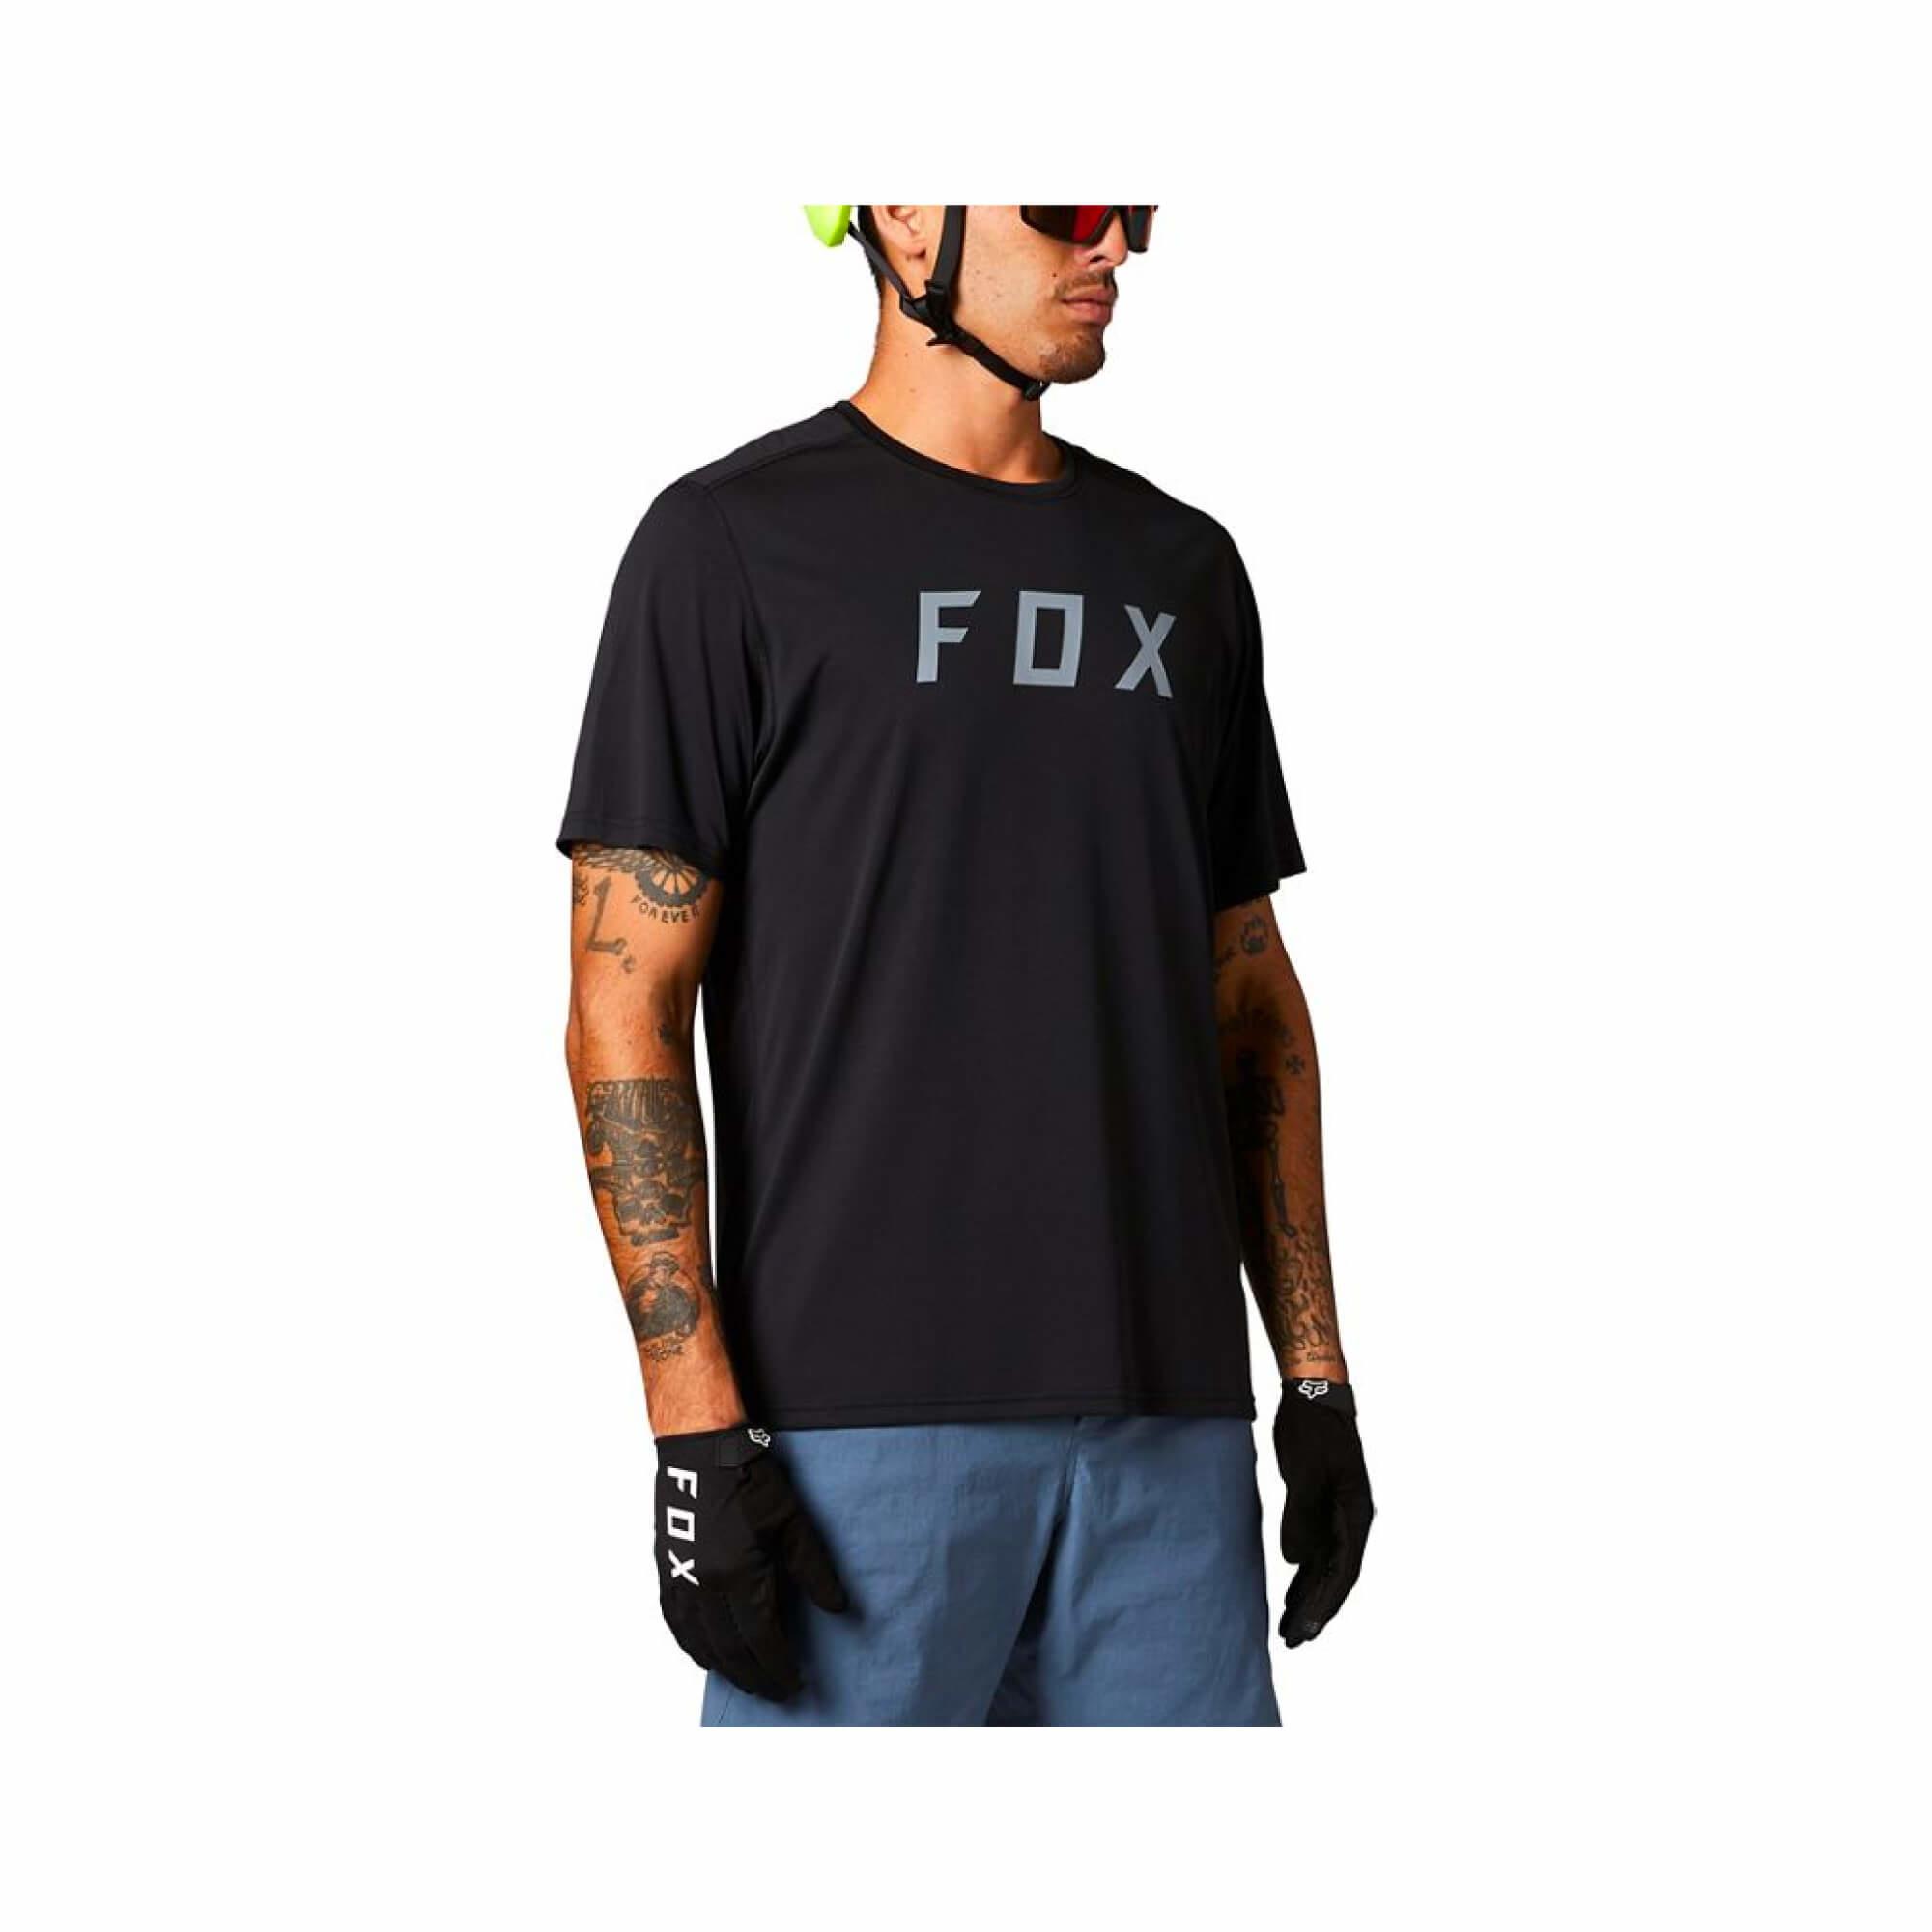 Ranger Short Sleeve Jersey FOX-1